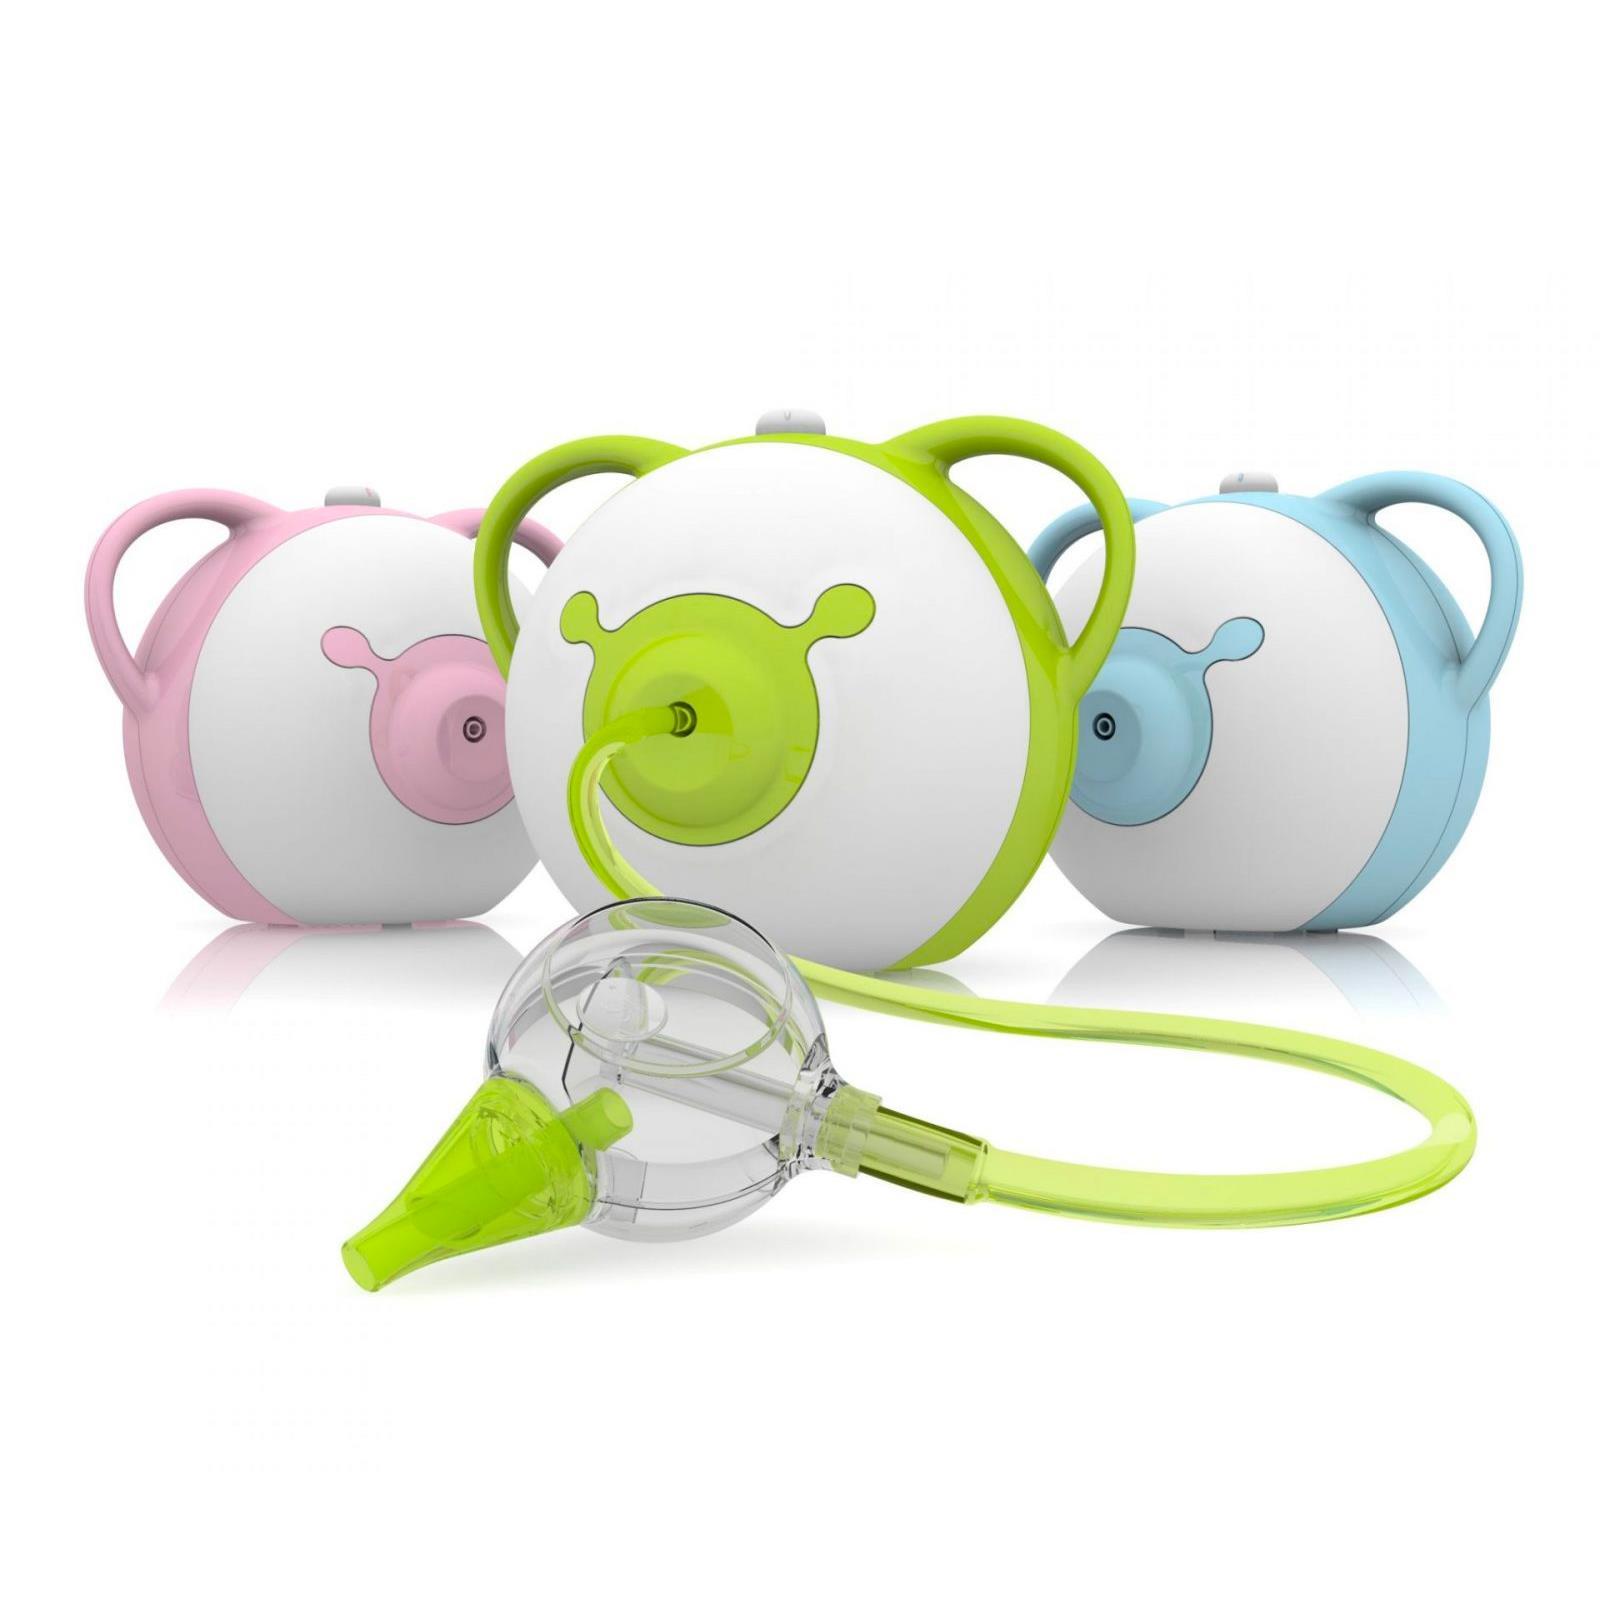 Nosiboo Pro Elektryczny aspirator do nosa